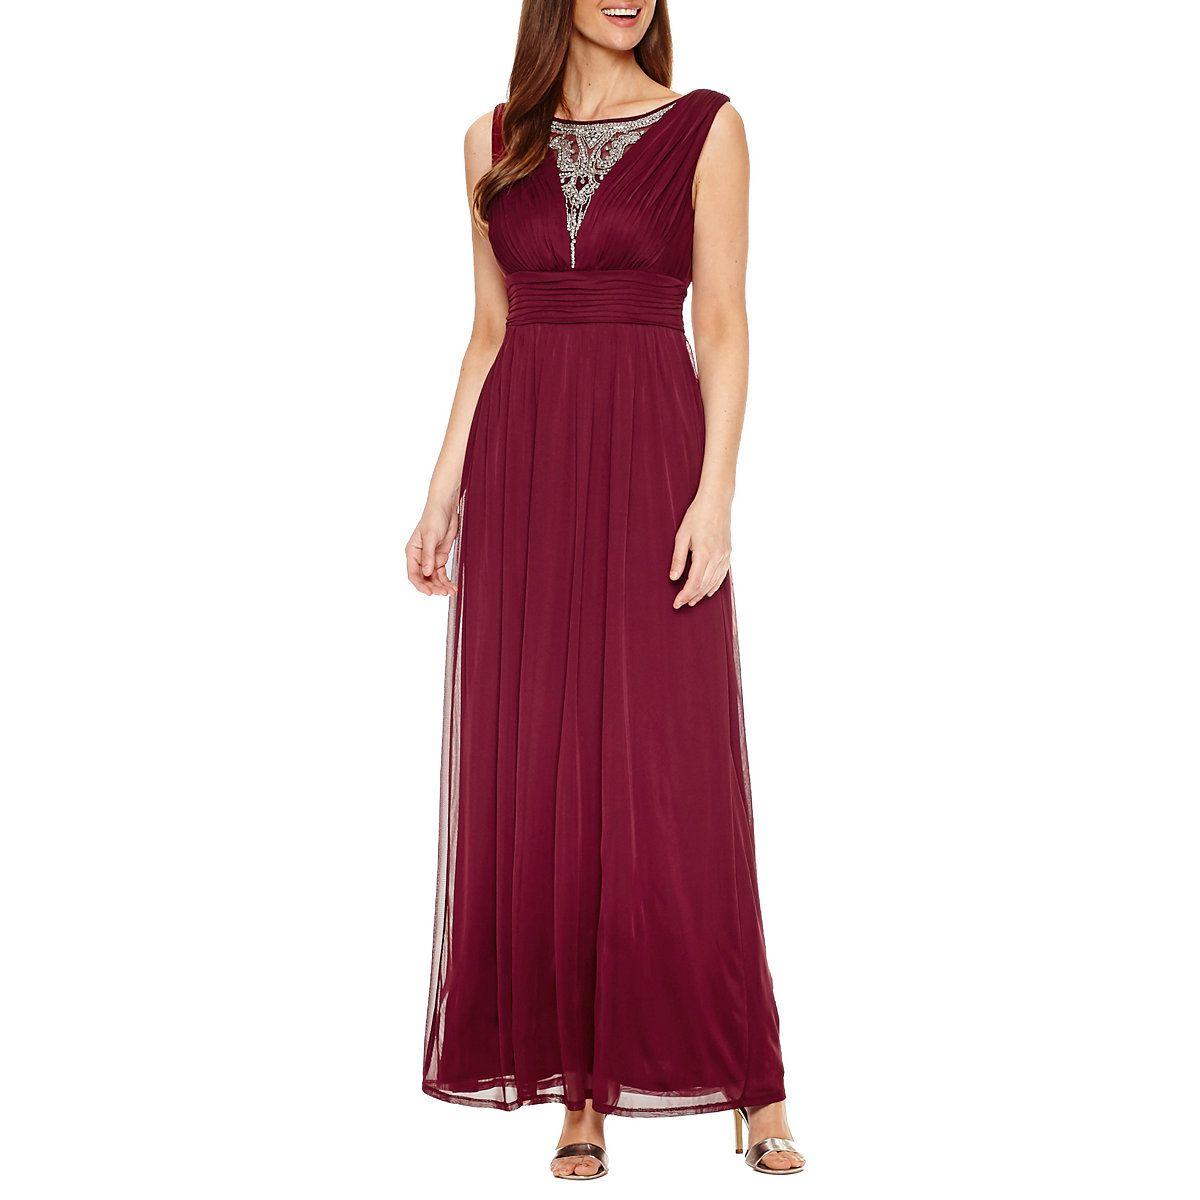 Melrose Sleeveless Evening Gown - JCPenney   JCP   Pinterest   Gowns ...